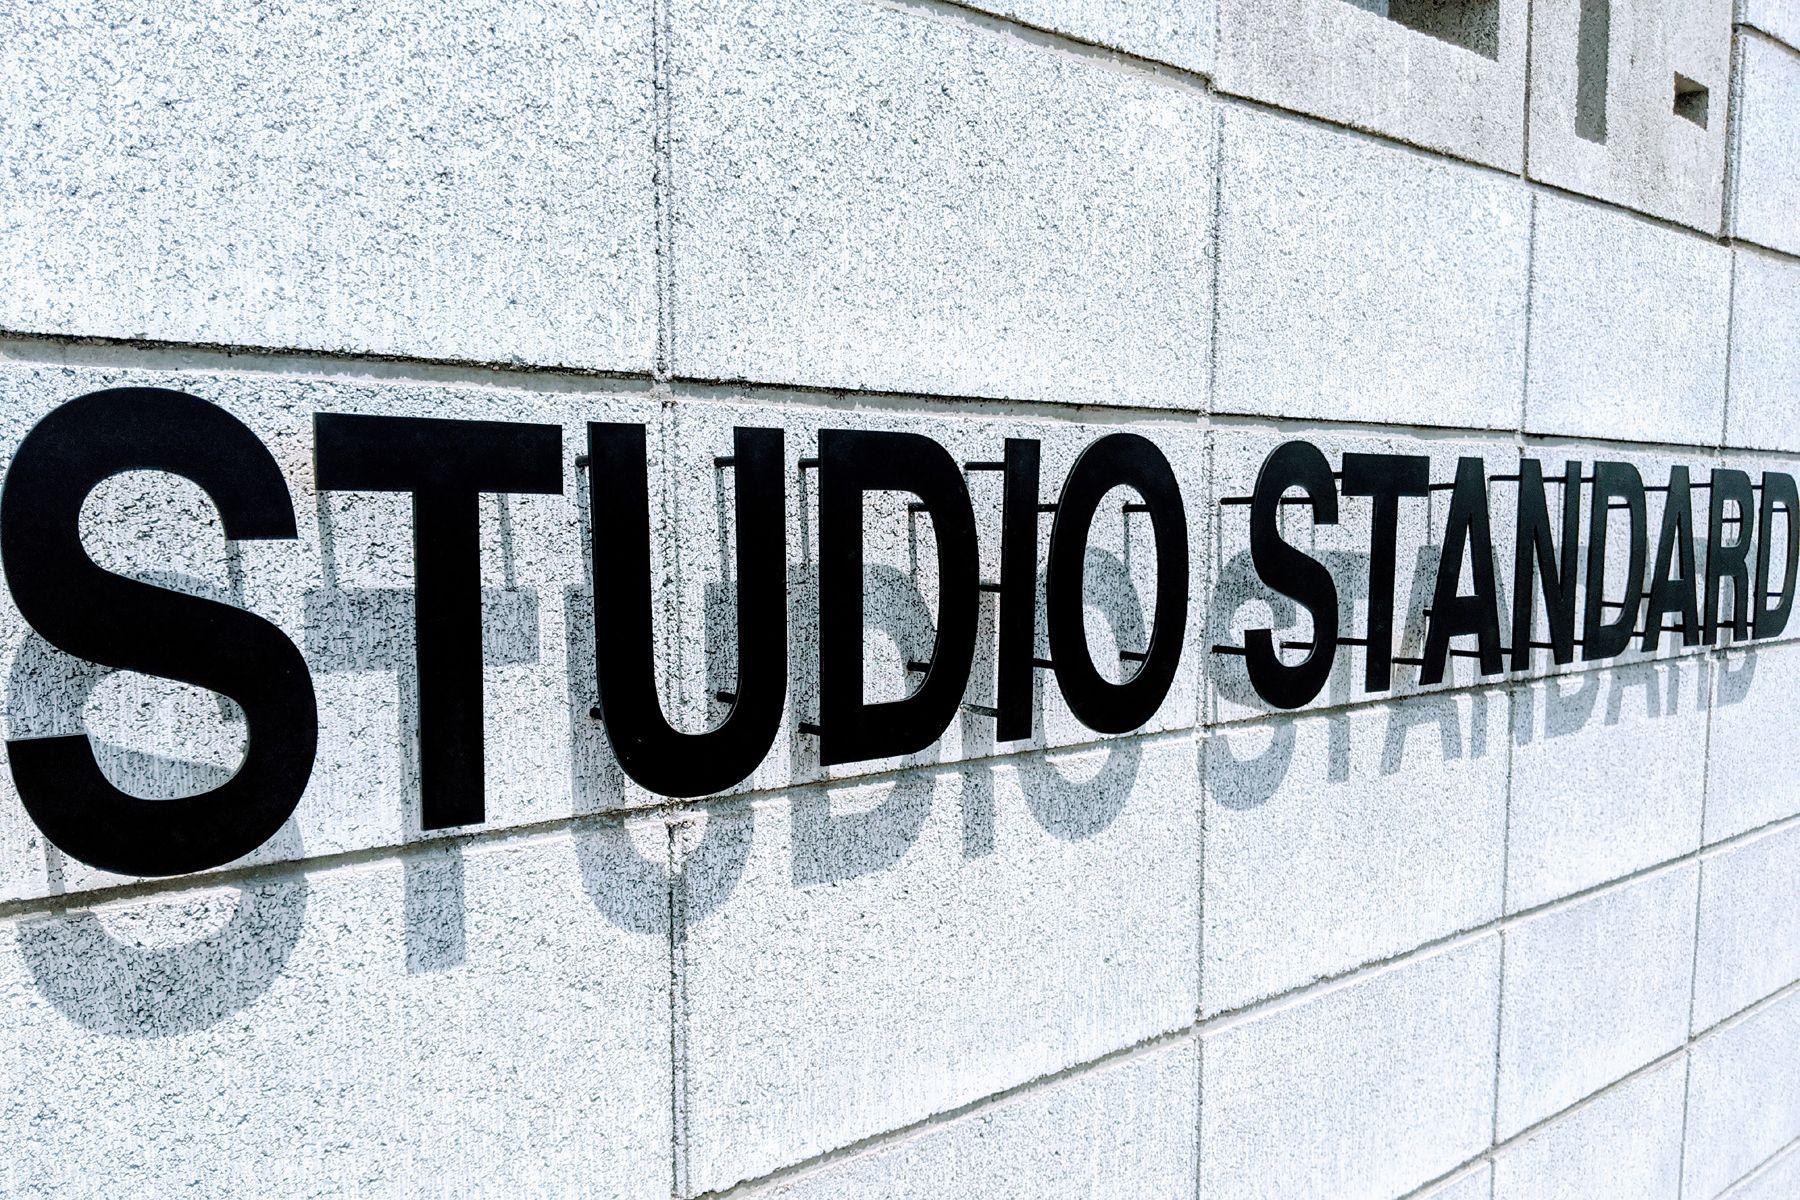 STUDIO STANDARD 玉堤 Ast (スタジオ スタンダード玉堤 Ast)